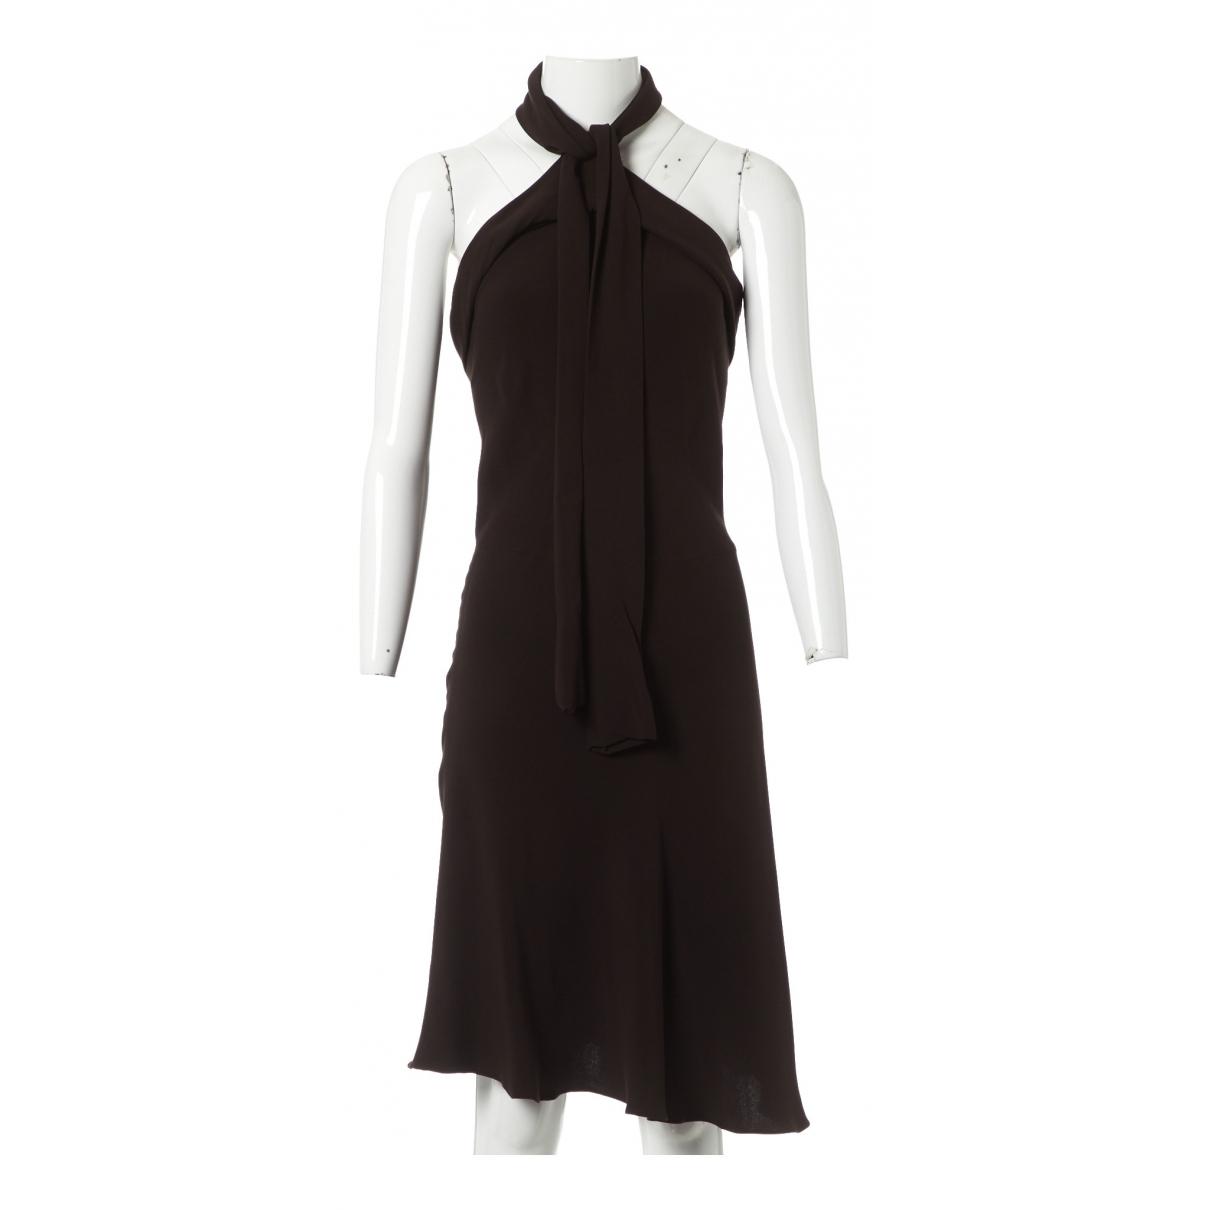 Balenciaga \N Kleid in  Braun Seide